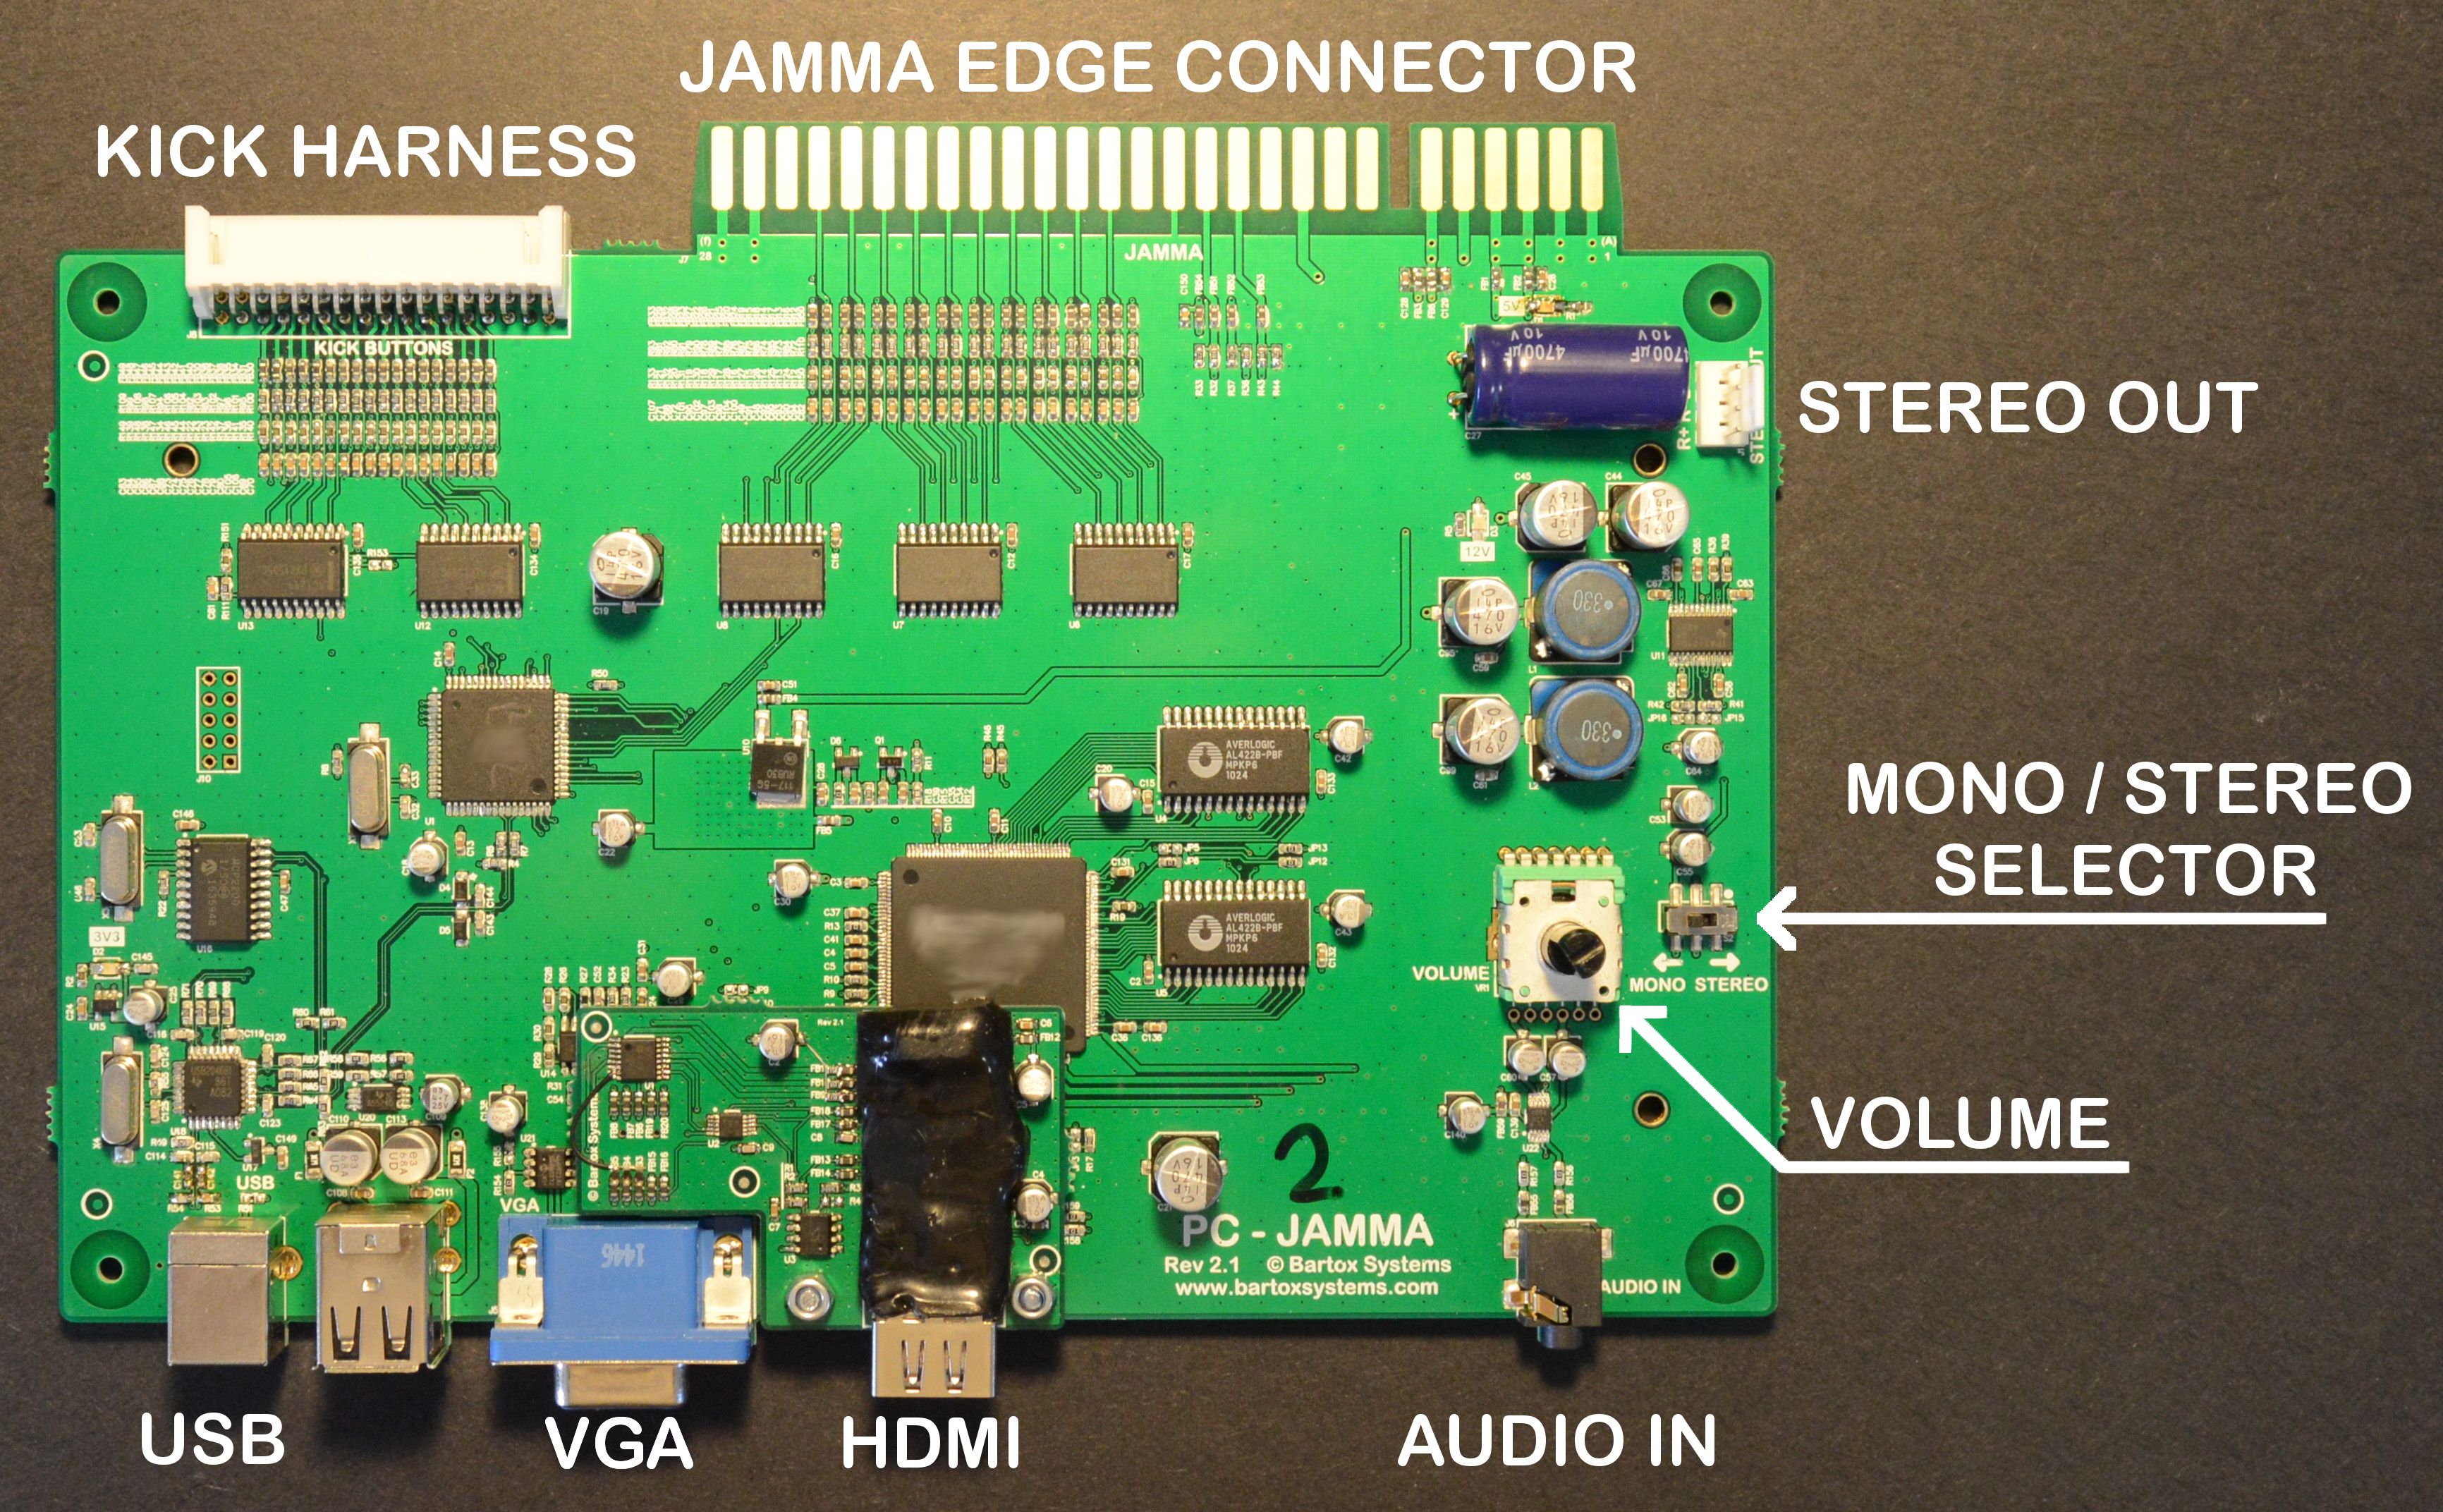 PC-JAMMA – Bartox Systems on